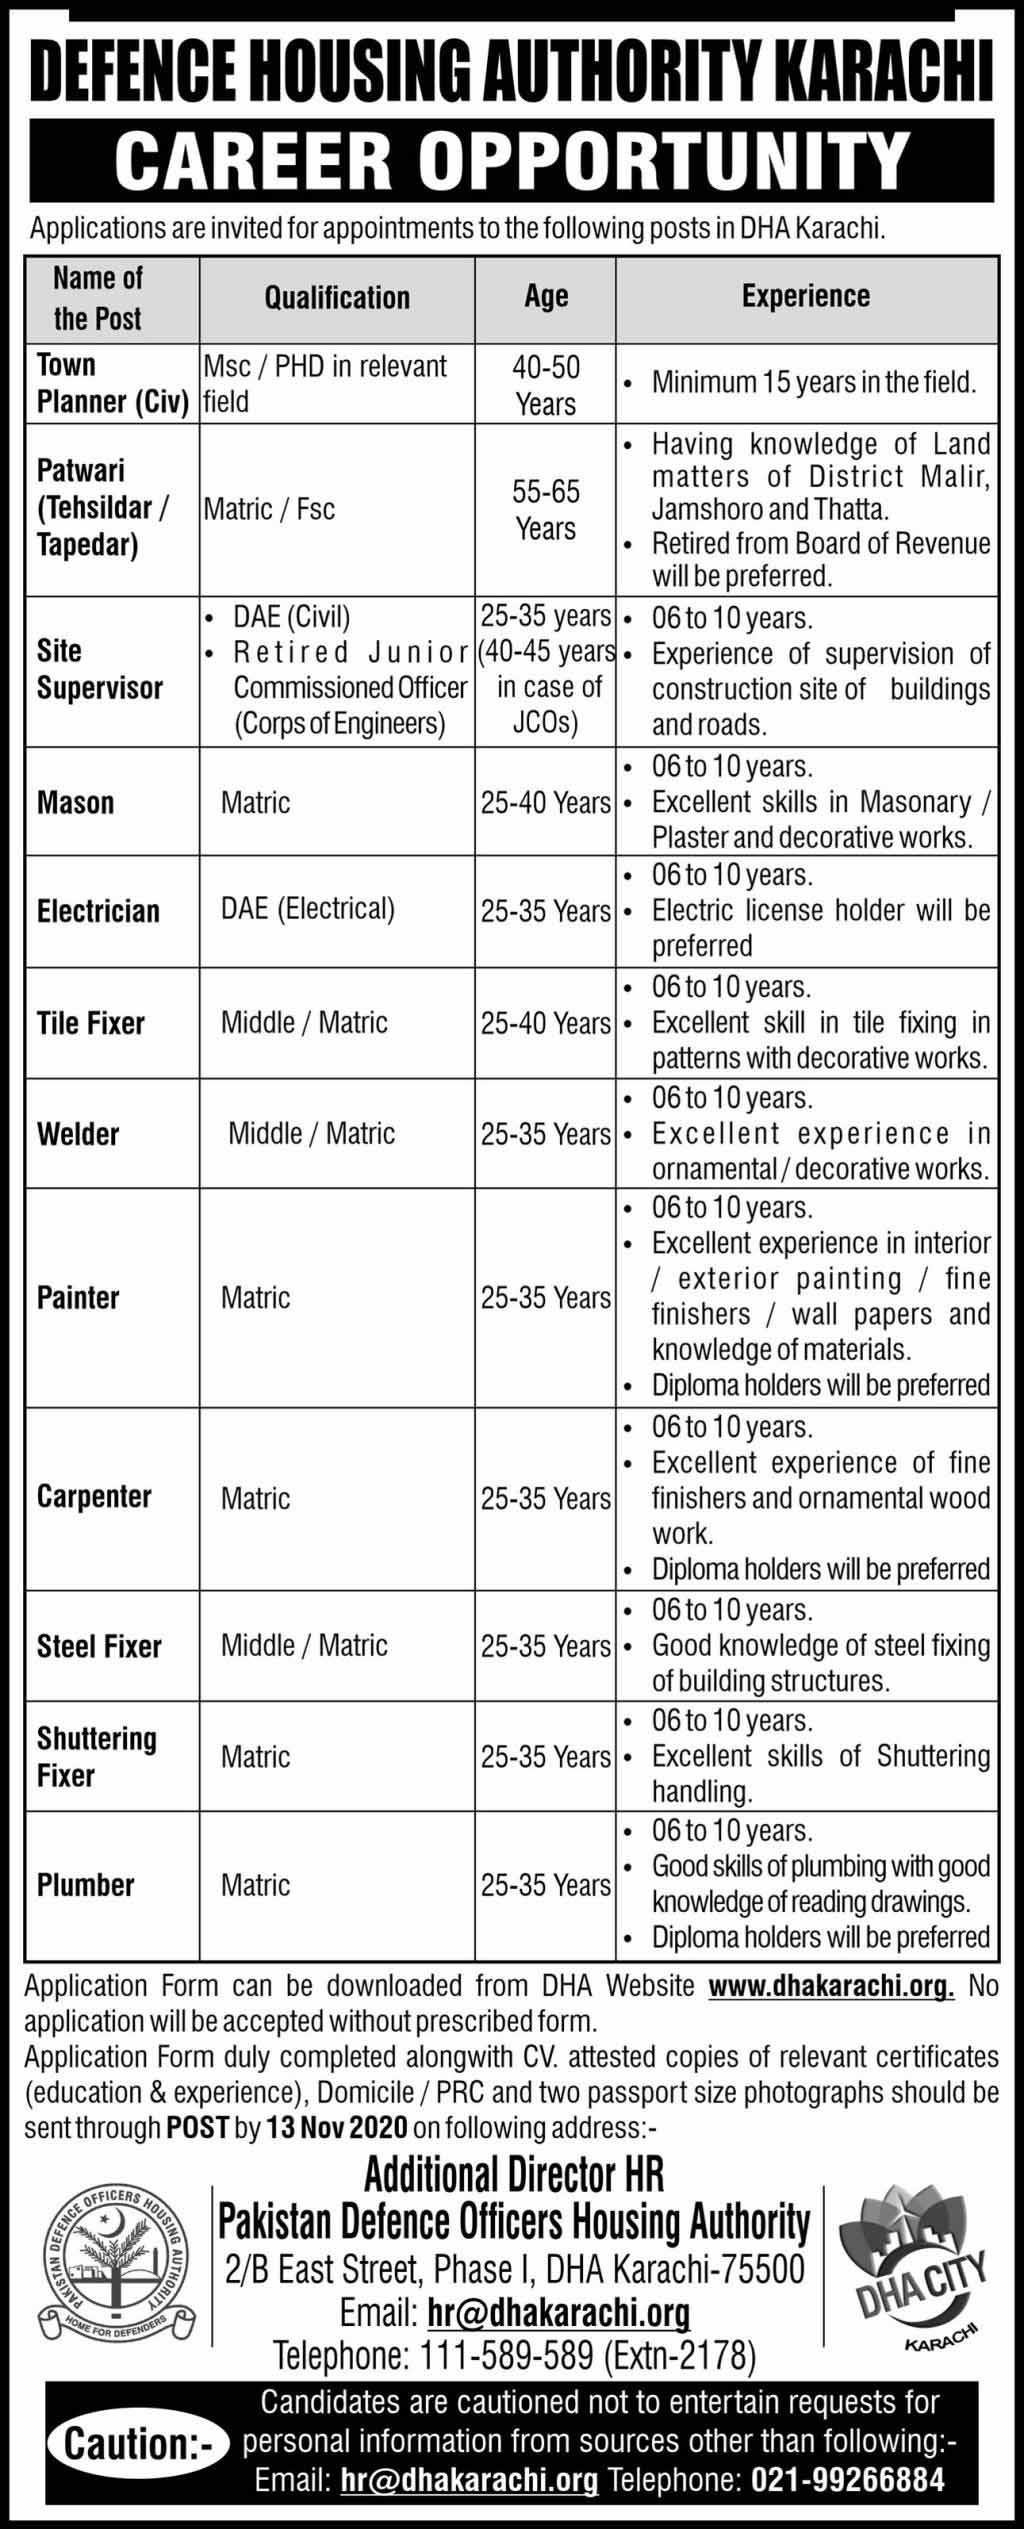 Defence Housing Authority Nov 2020 Jobs in Karachi